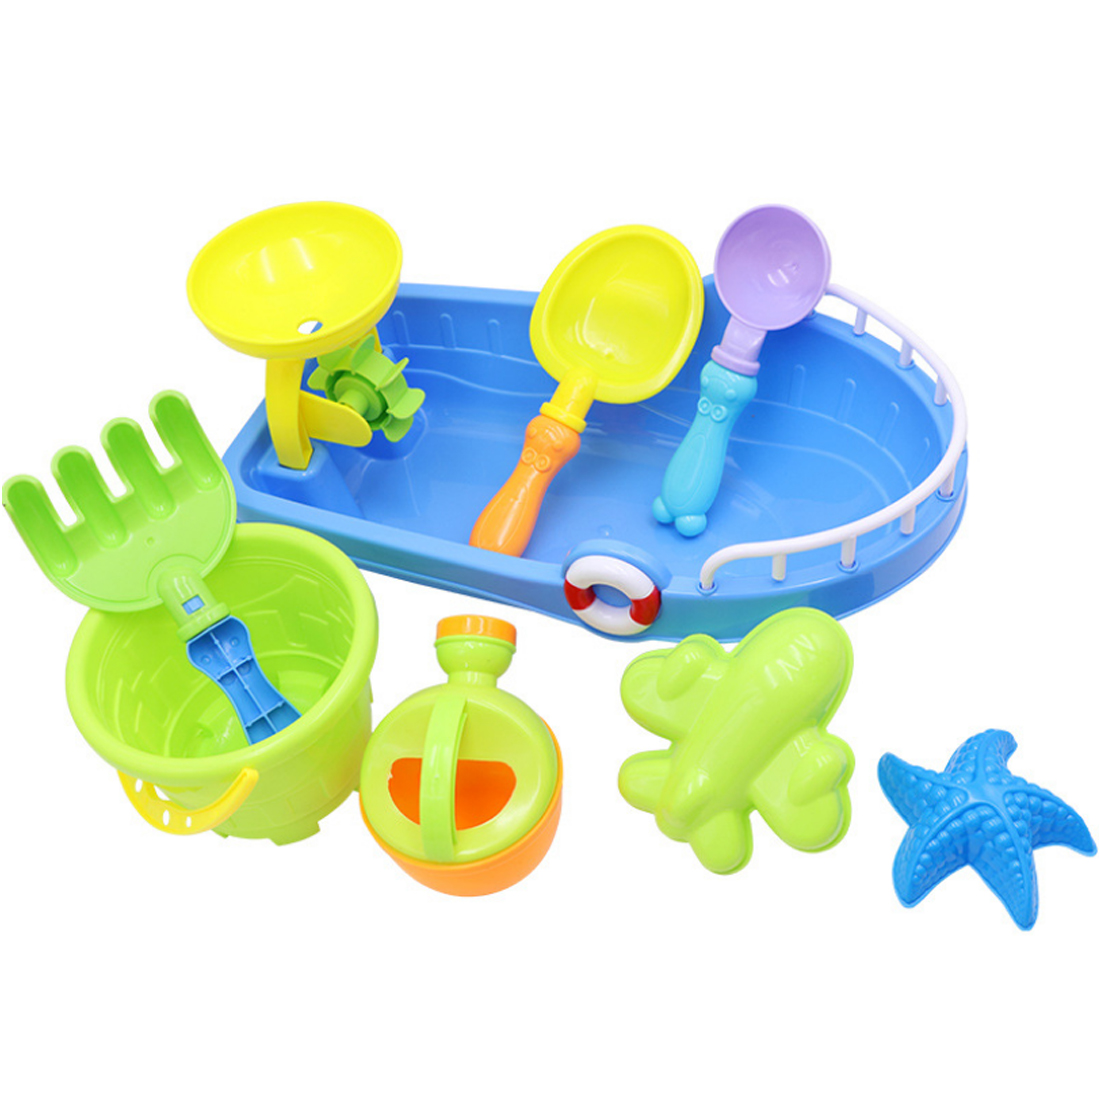 NFSTRIKE 9Pcs Children Outdoor Beach Sand Toy Boat Play Tool Playset Kids Beach Sand Toys Set - Random Color